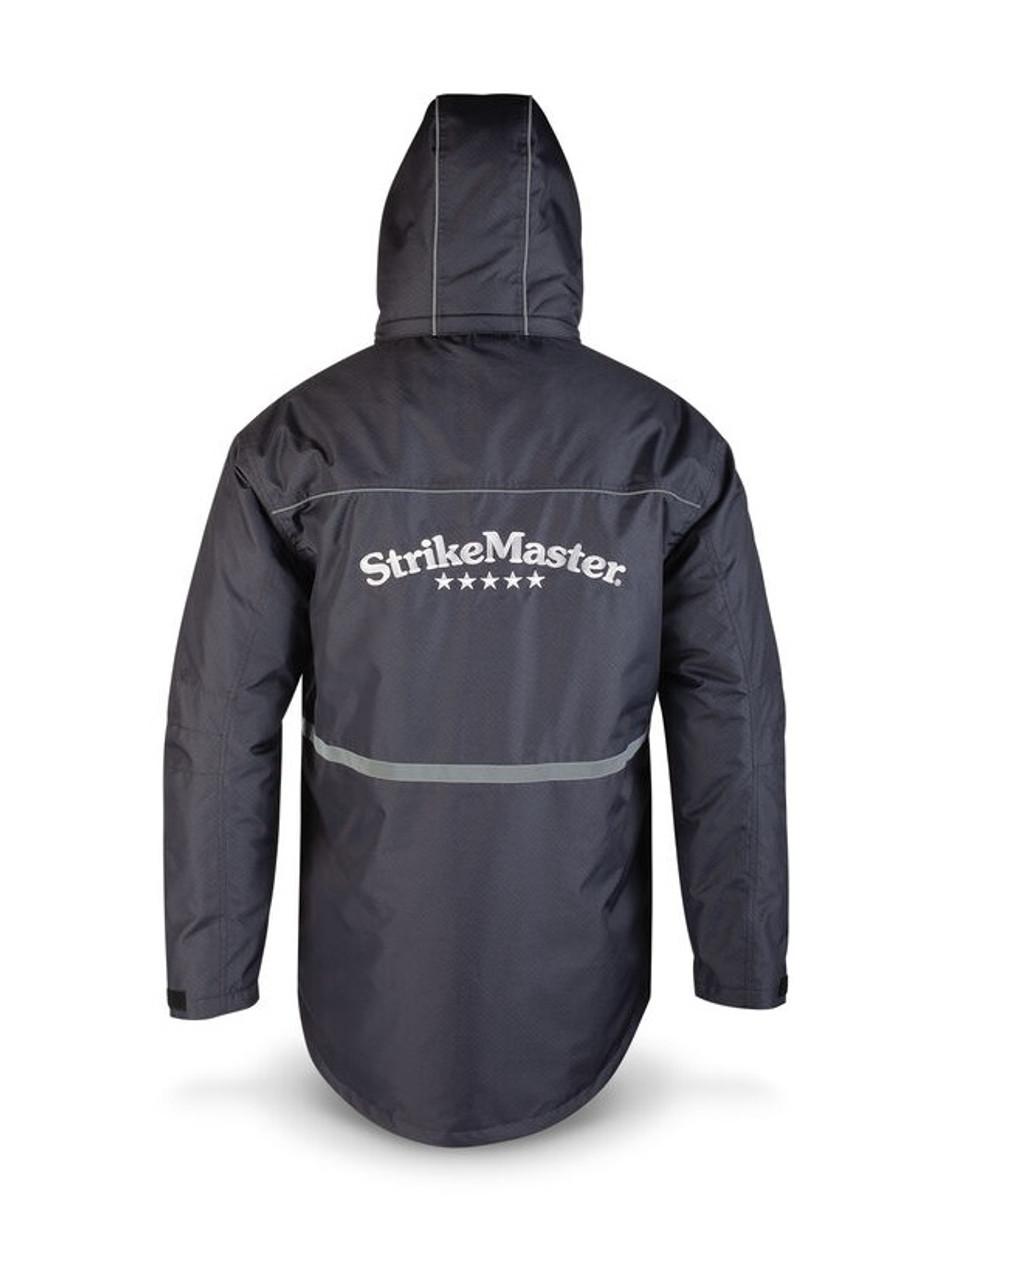 Strikemaster Men's Pro Ice Fishing Jacket SPJF